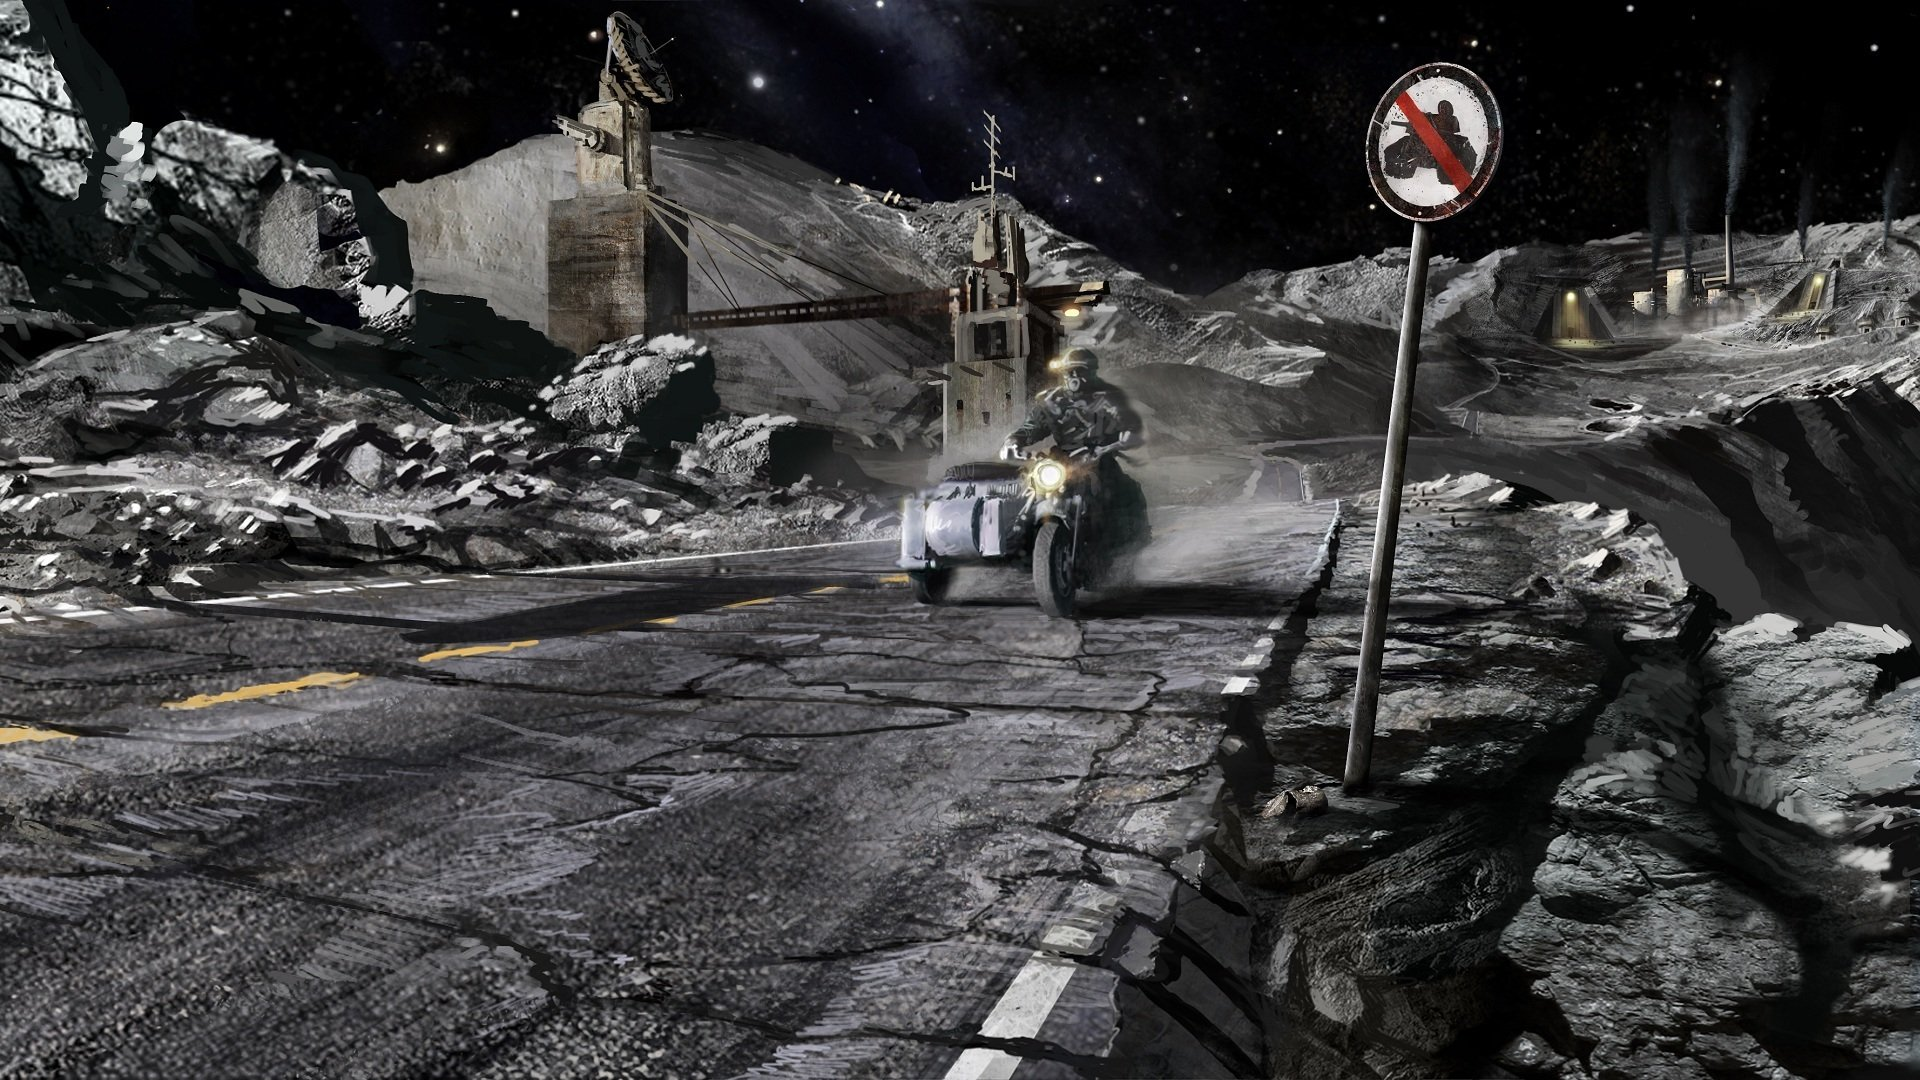 nazi moon base iron sky - photo #17